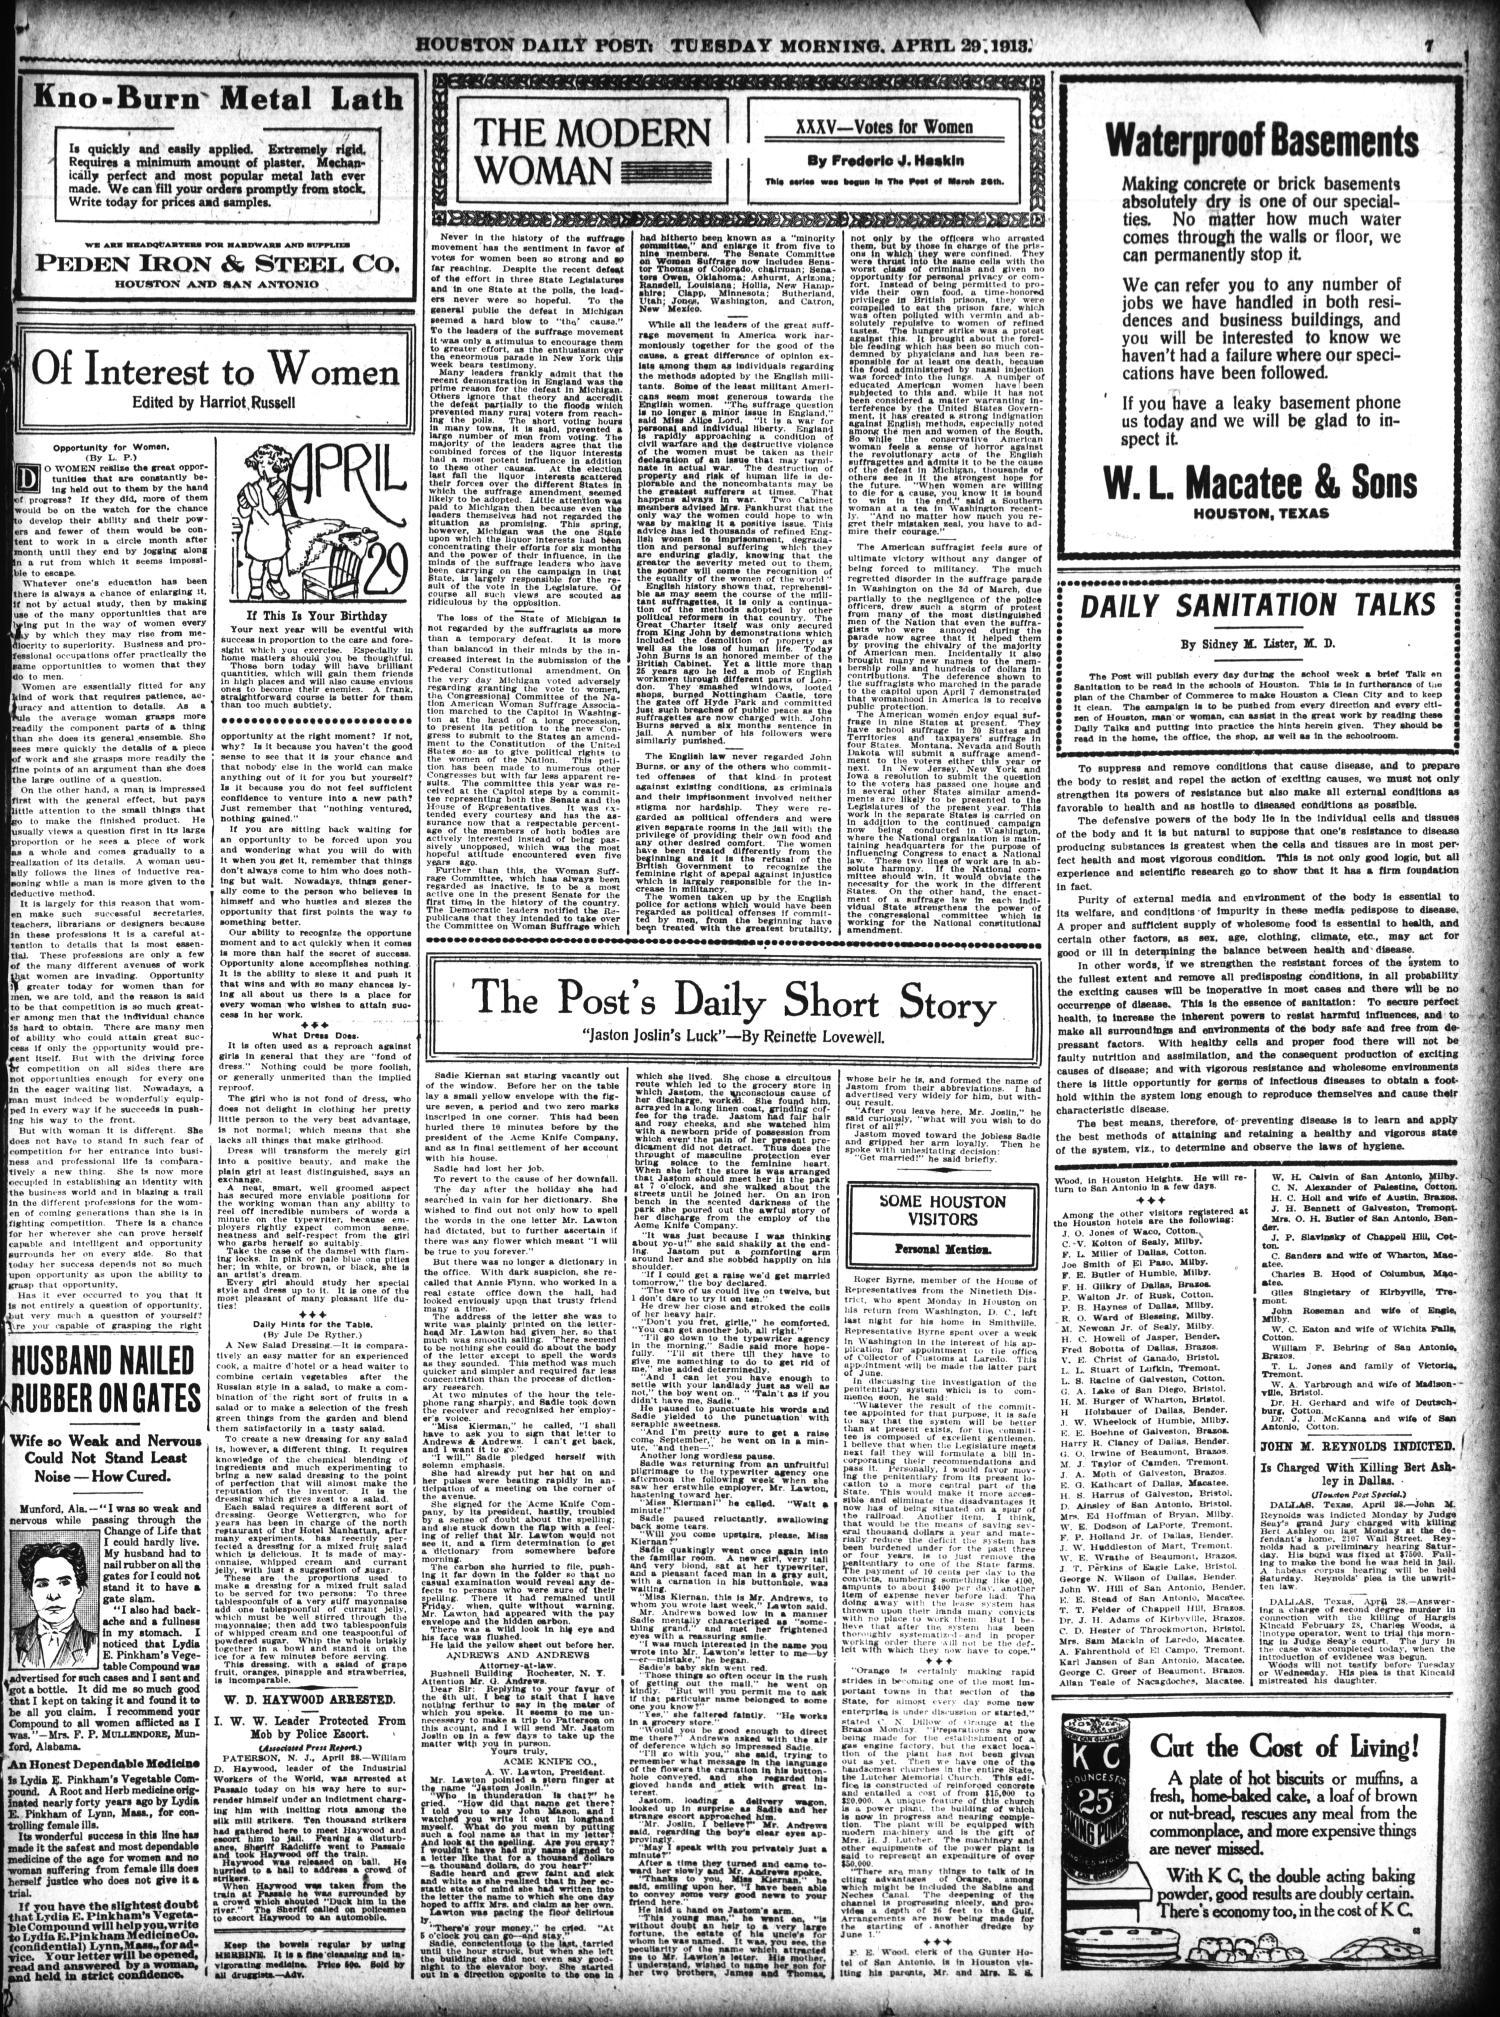 The Houston Post. (Houston, Tex.), Vol. 28, Ed. 1 Tuesday, April 29, 1913 -  Page 7 of 26 - The Portal to Texas History